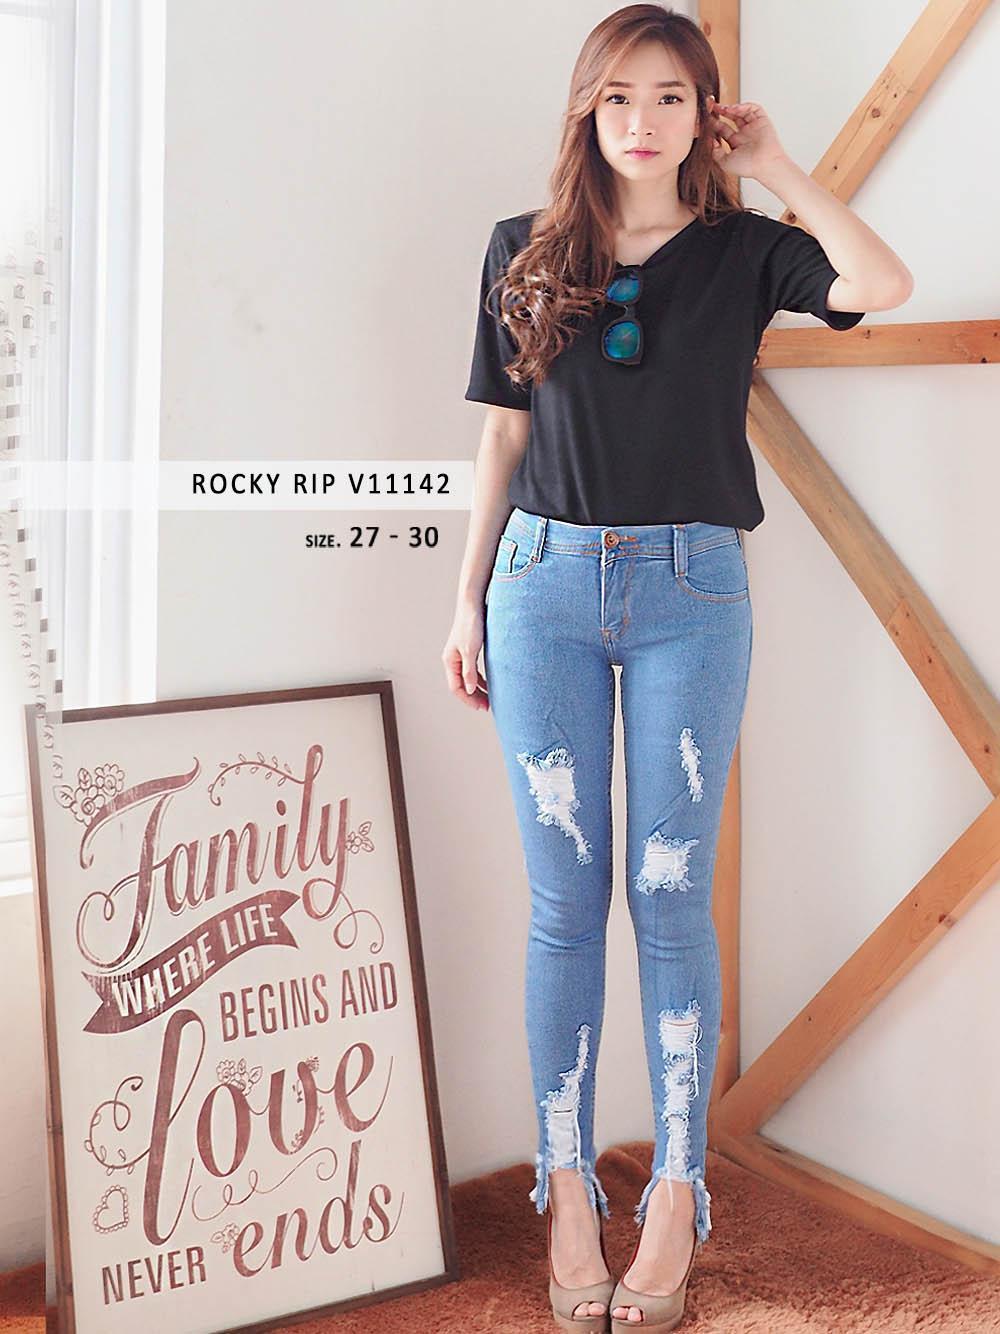 Celana panjang jeans Ripped skinny wanita murah JEANS BEST SELLER!!IDR139900. Rp 150.000